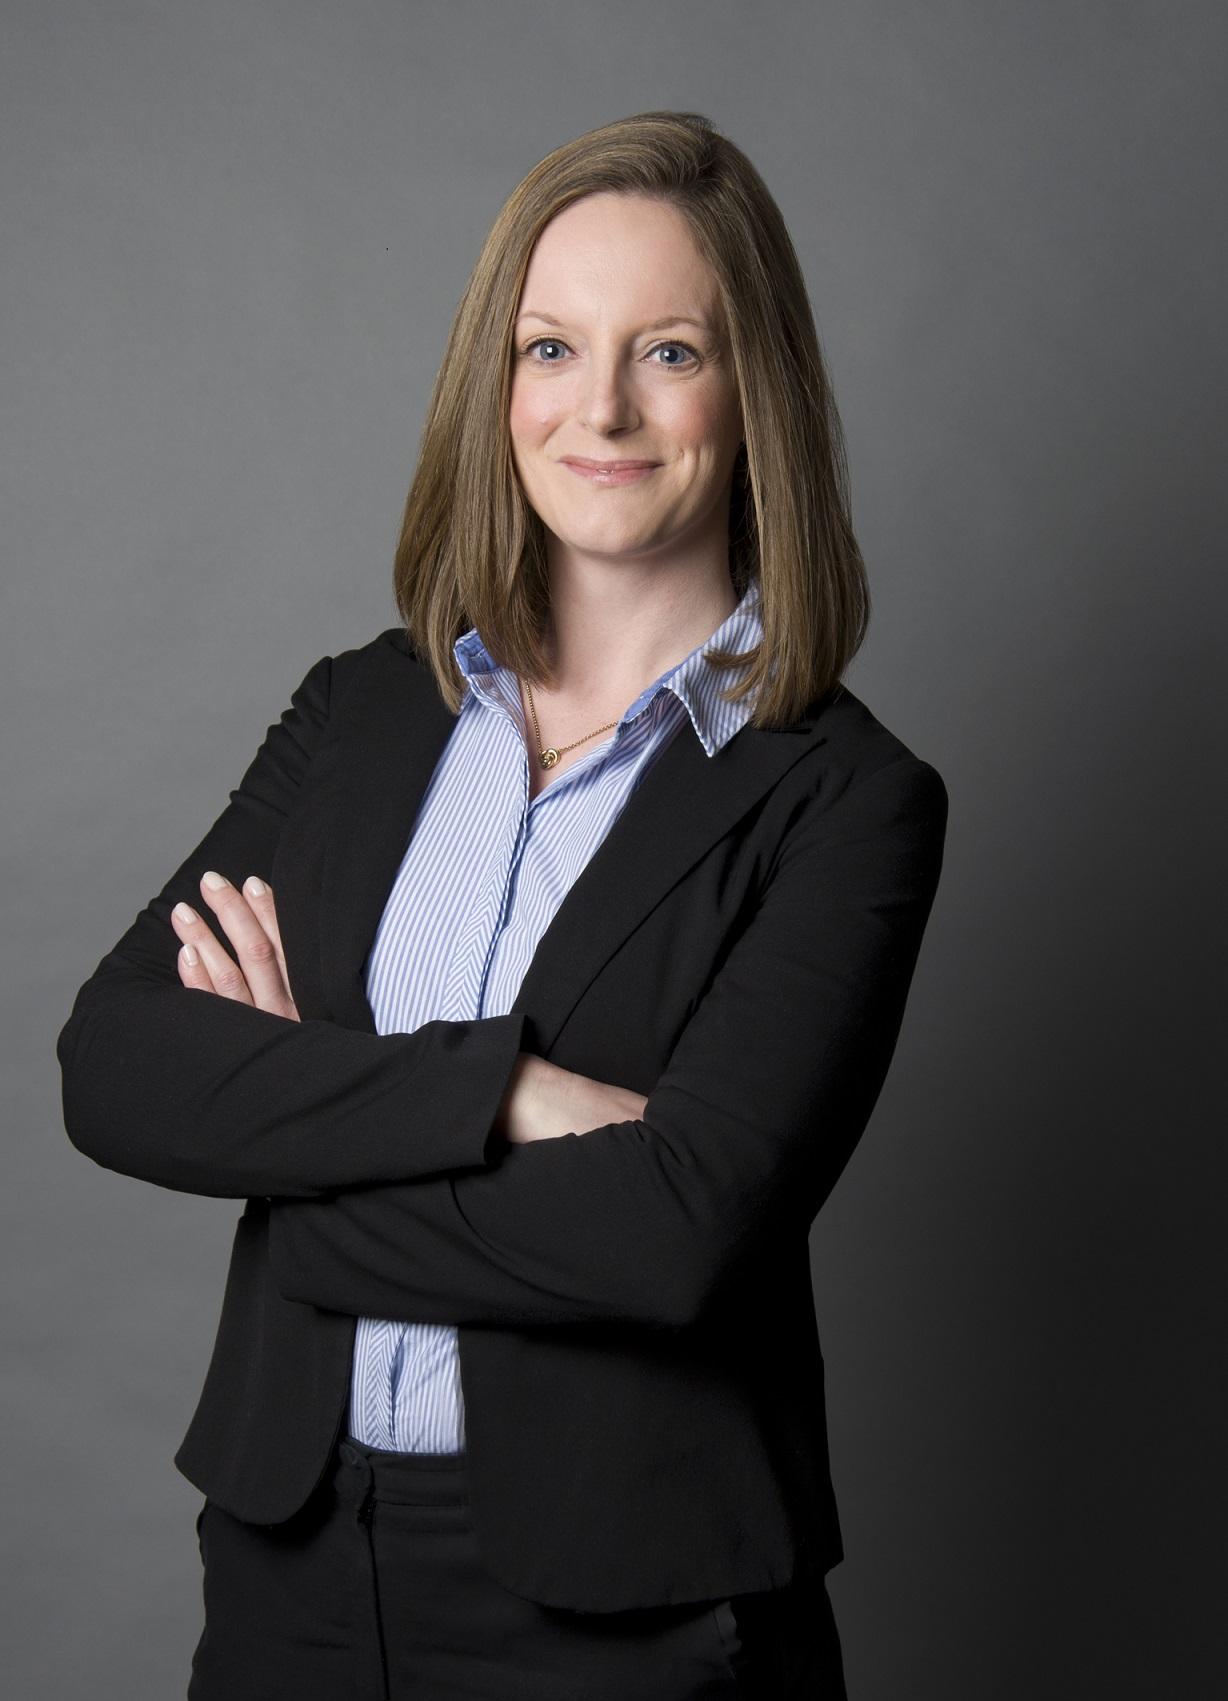 Ann Christin Janz